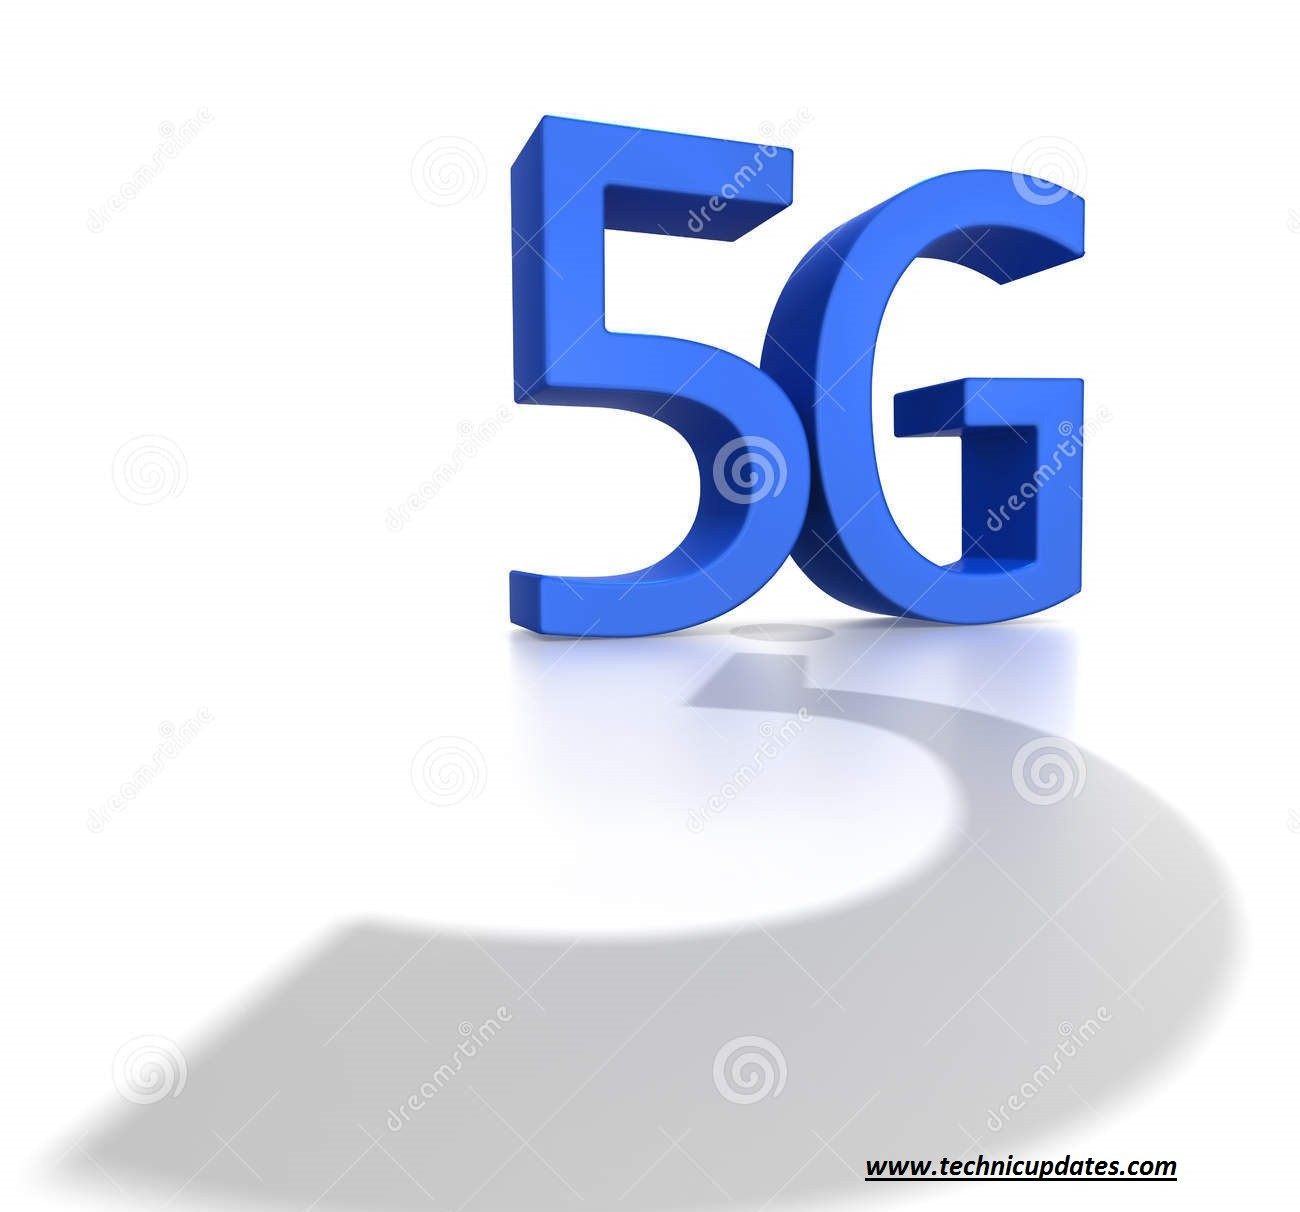 China Mobile запустит 5G к 2020г